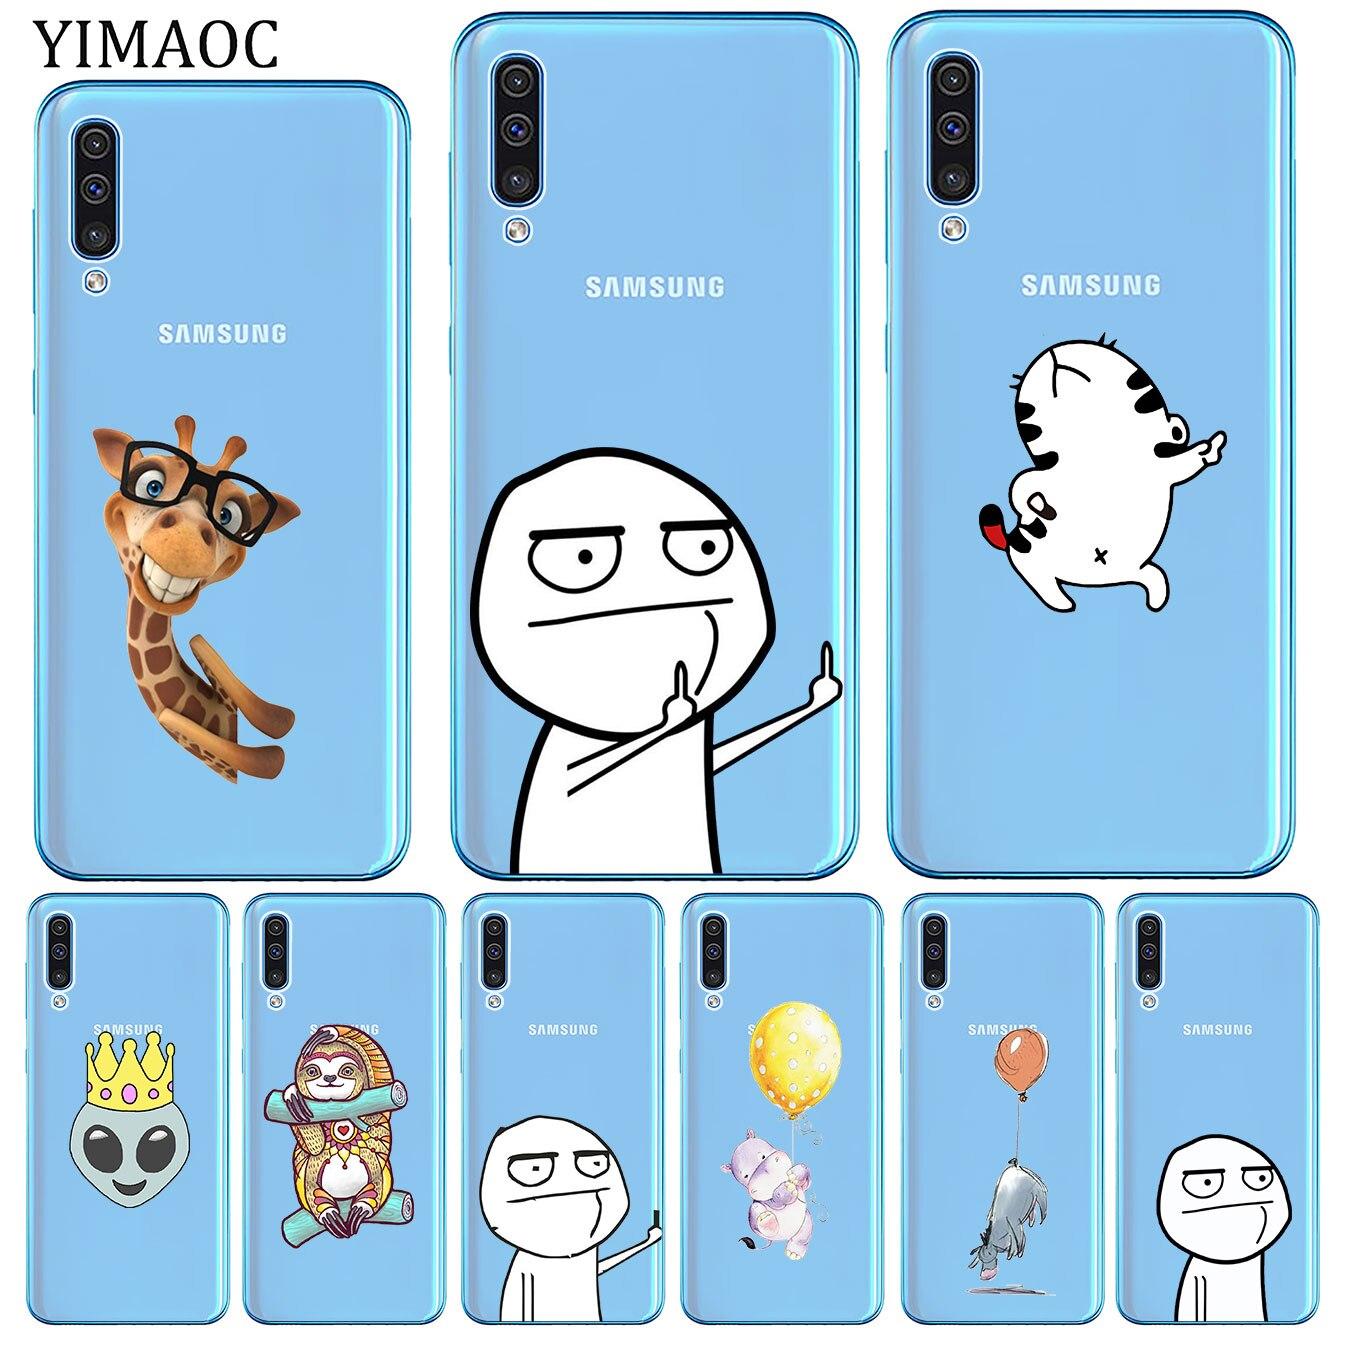 Meme gesicht Mittelfinger Lustige Cartoon Liebhaber Weichen Fall für Samsung Galaxy A70 A60 A50 A40 A30 A20 A10 M10 m20 M30 M40 A20E